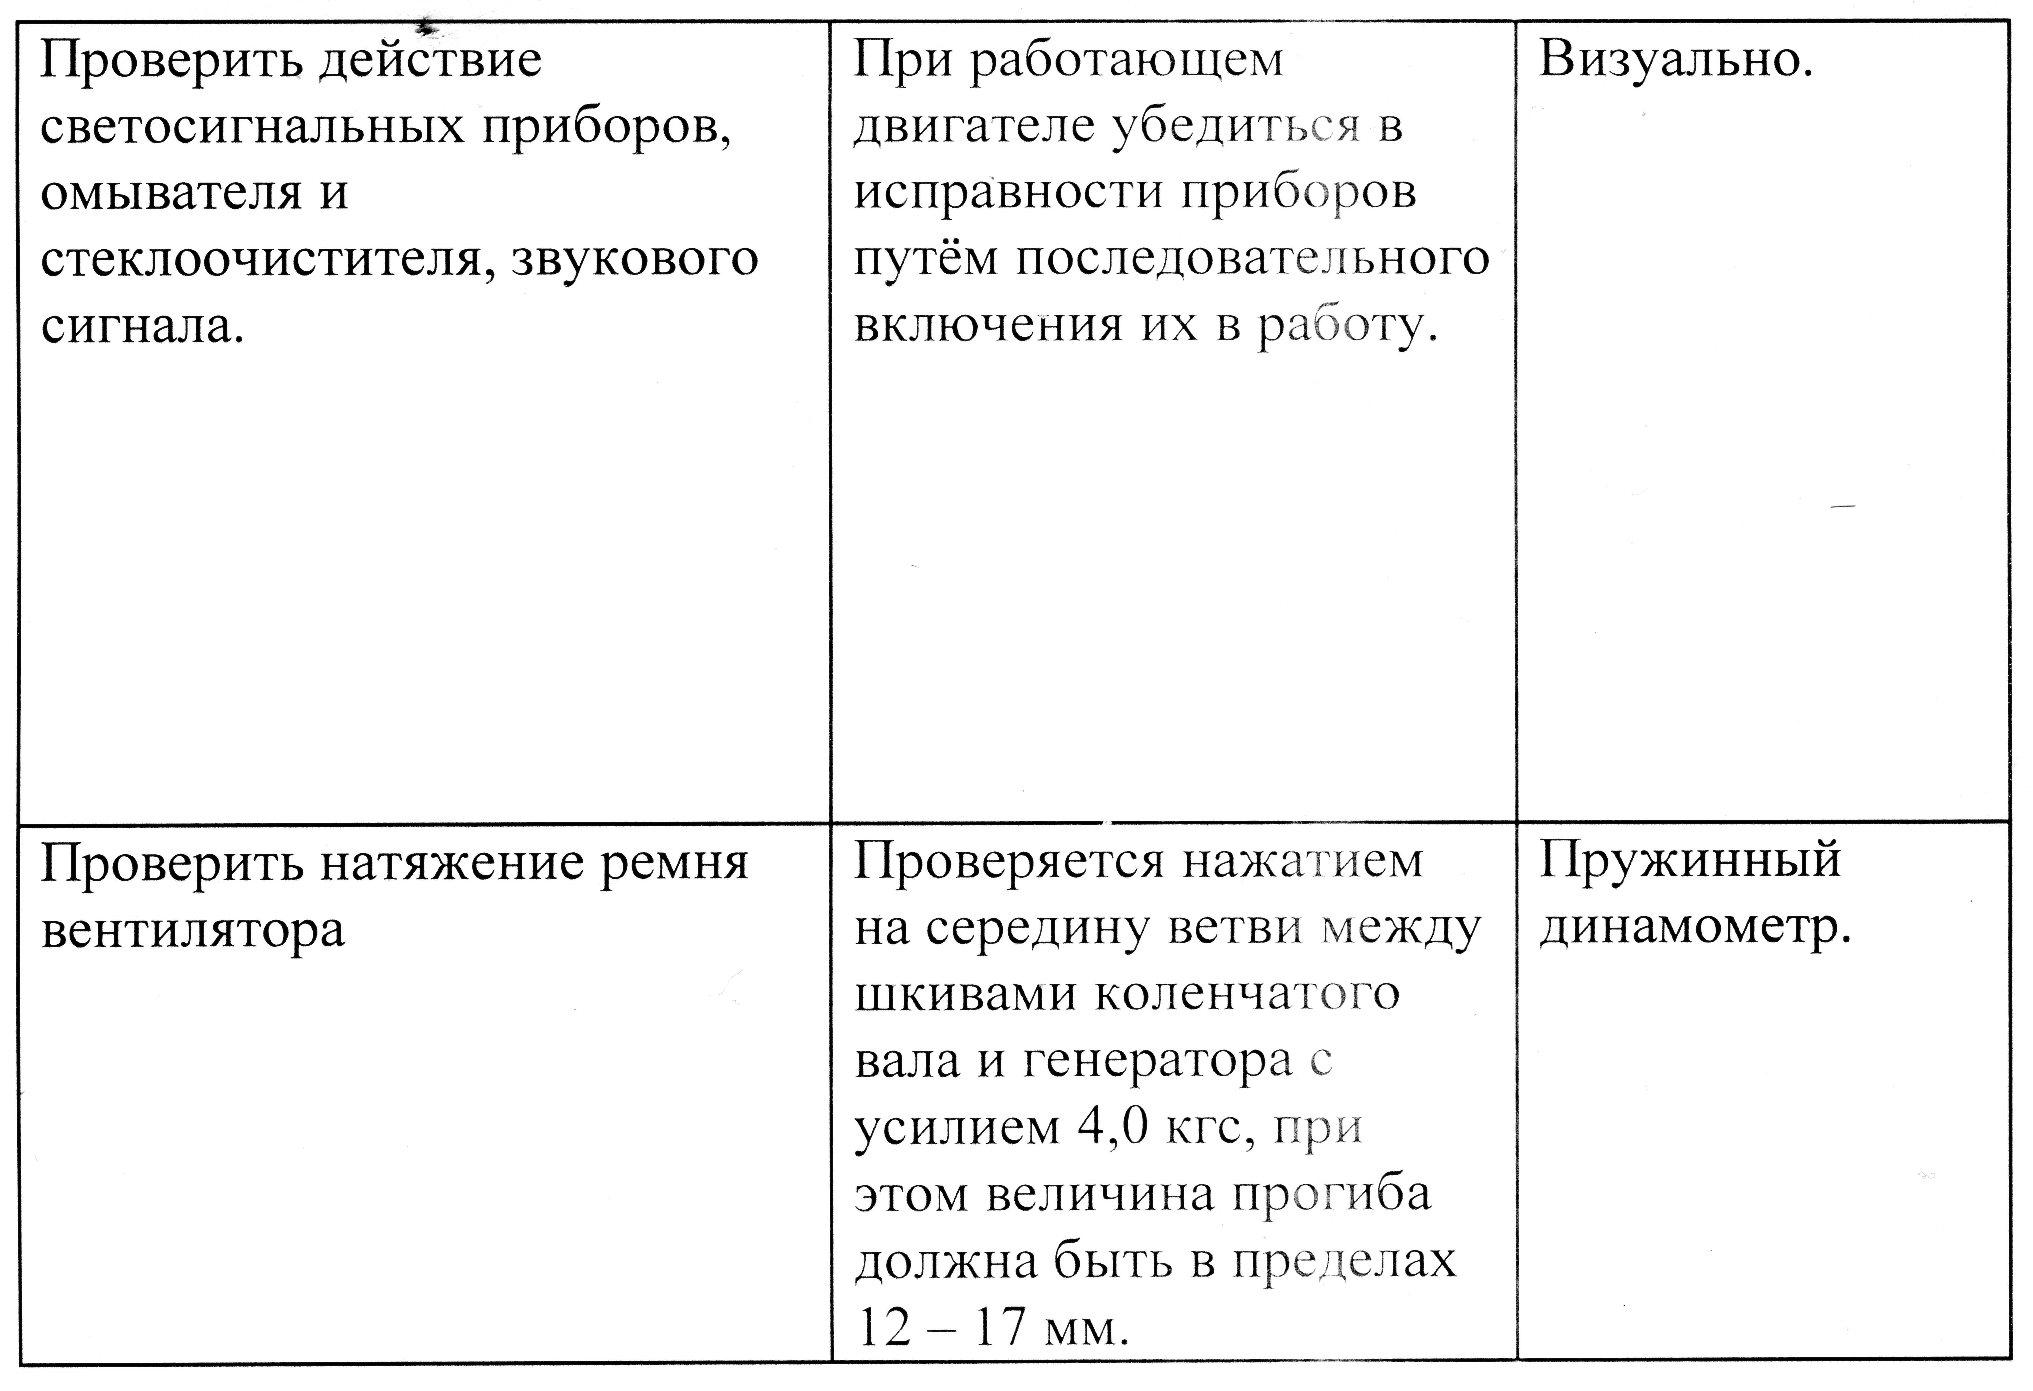 C:\Users\Василий Мельченко\Pictures\img633.jpg